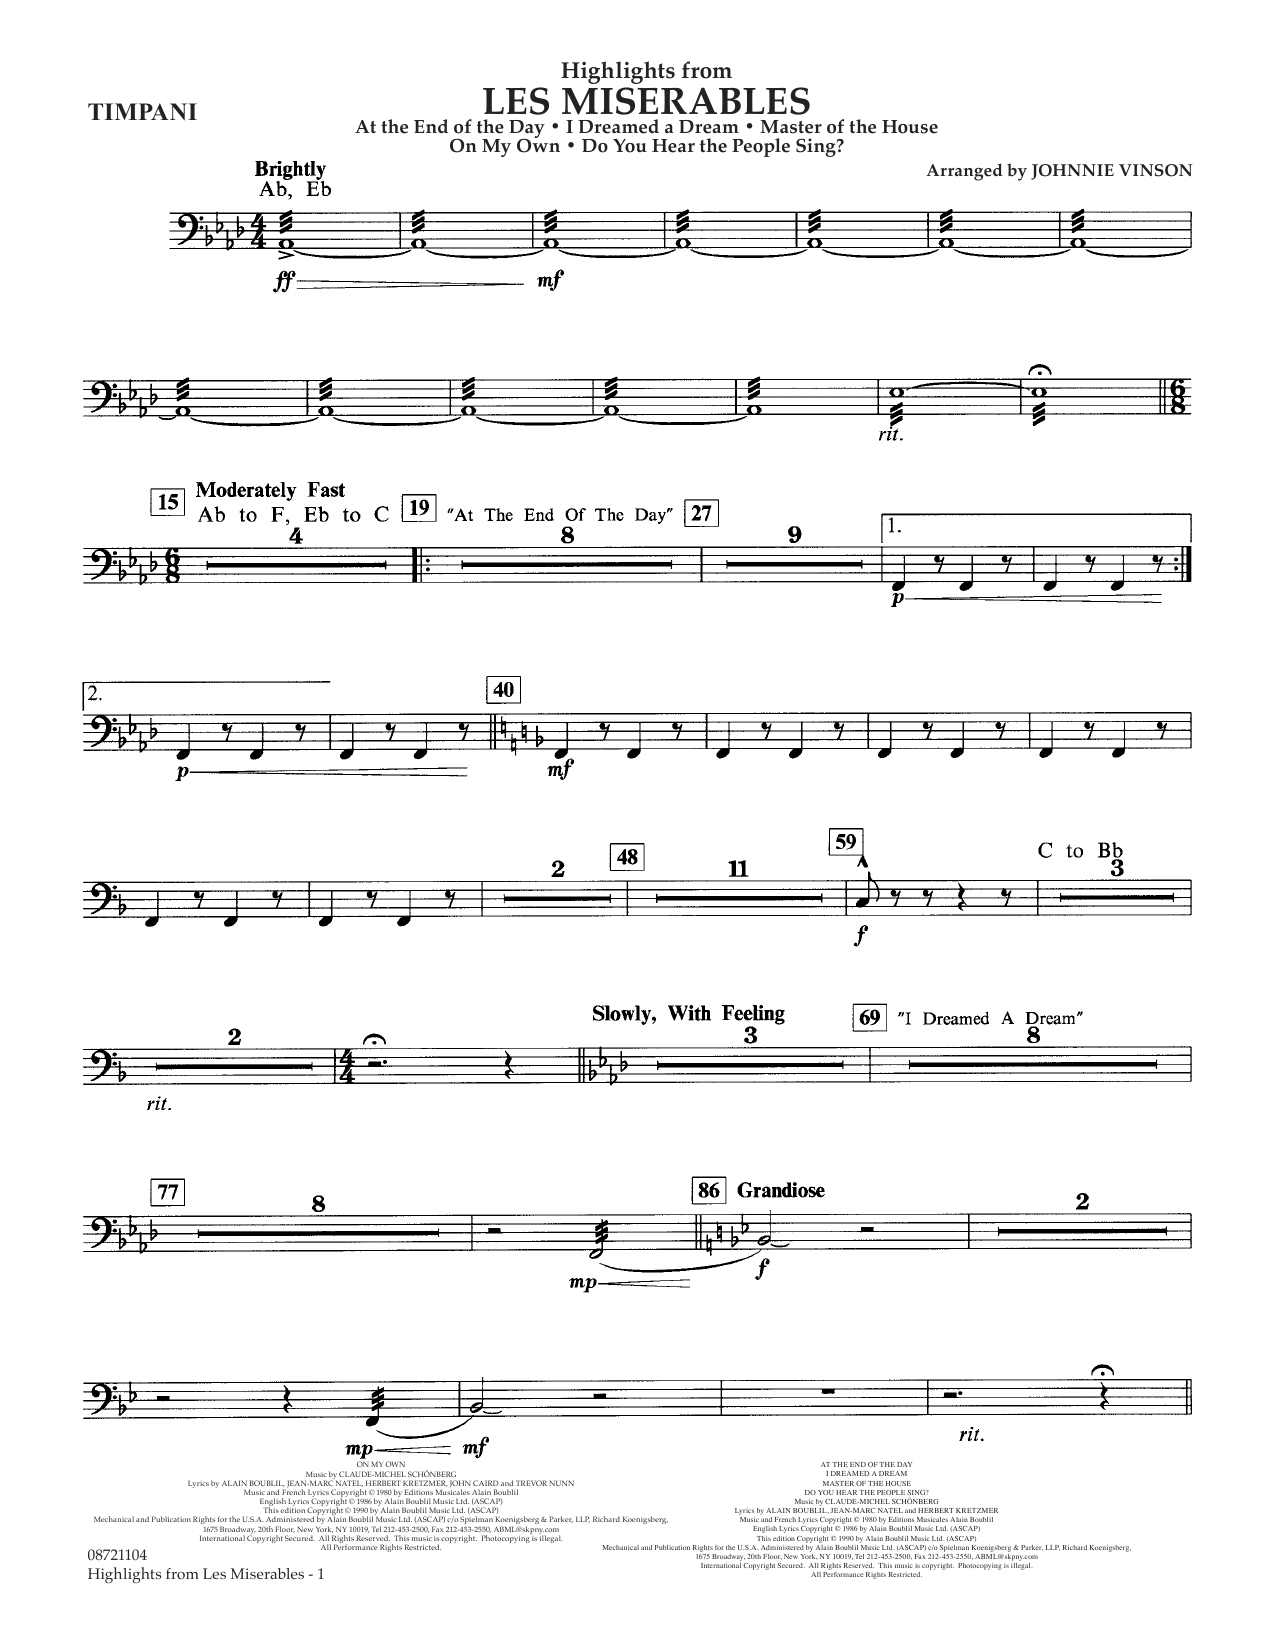 Highlights from Les Misérables (arr. Johnnie Vinson) - Timpani (Concert Band)